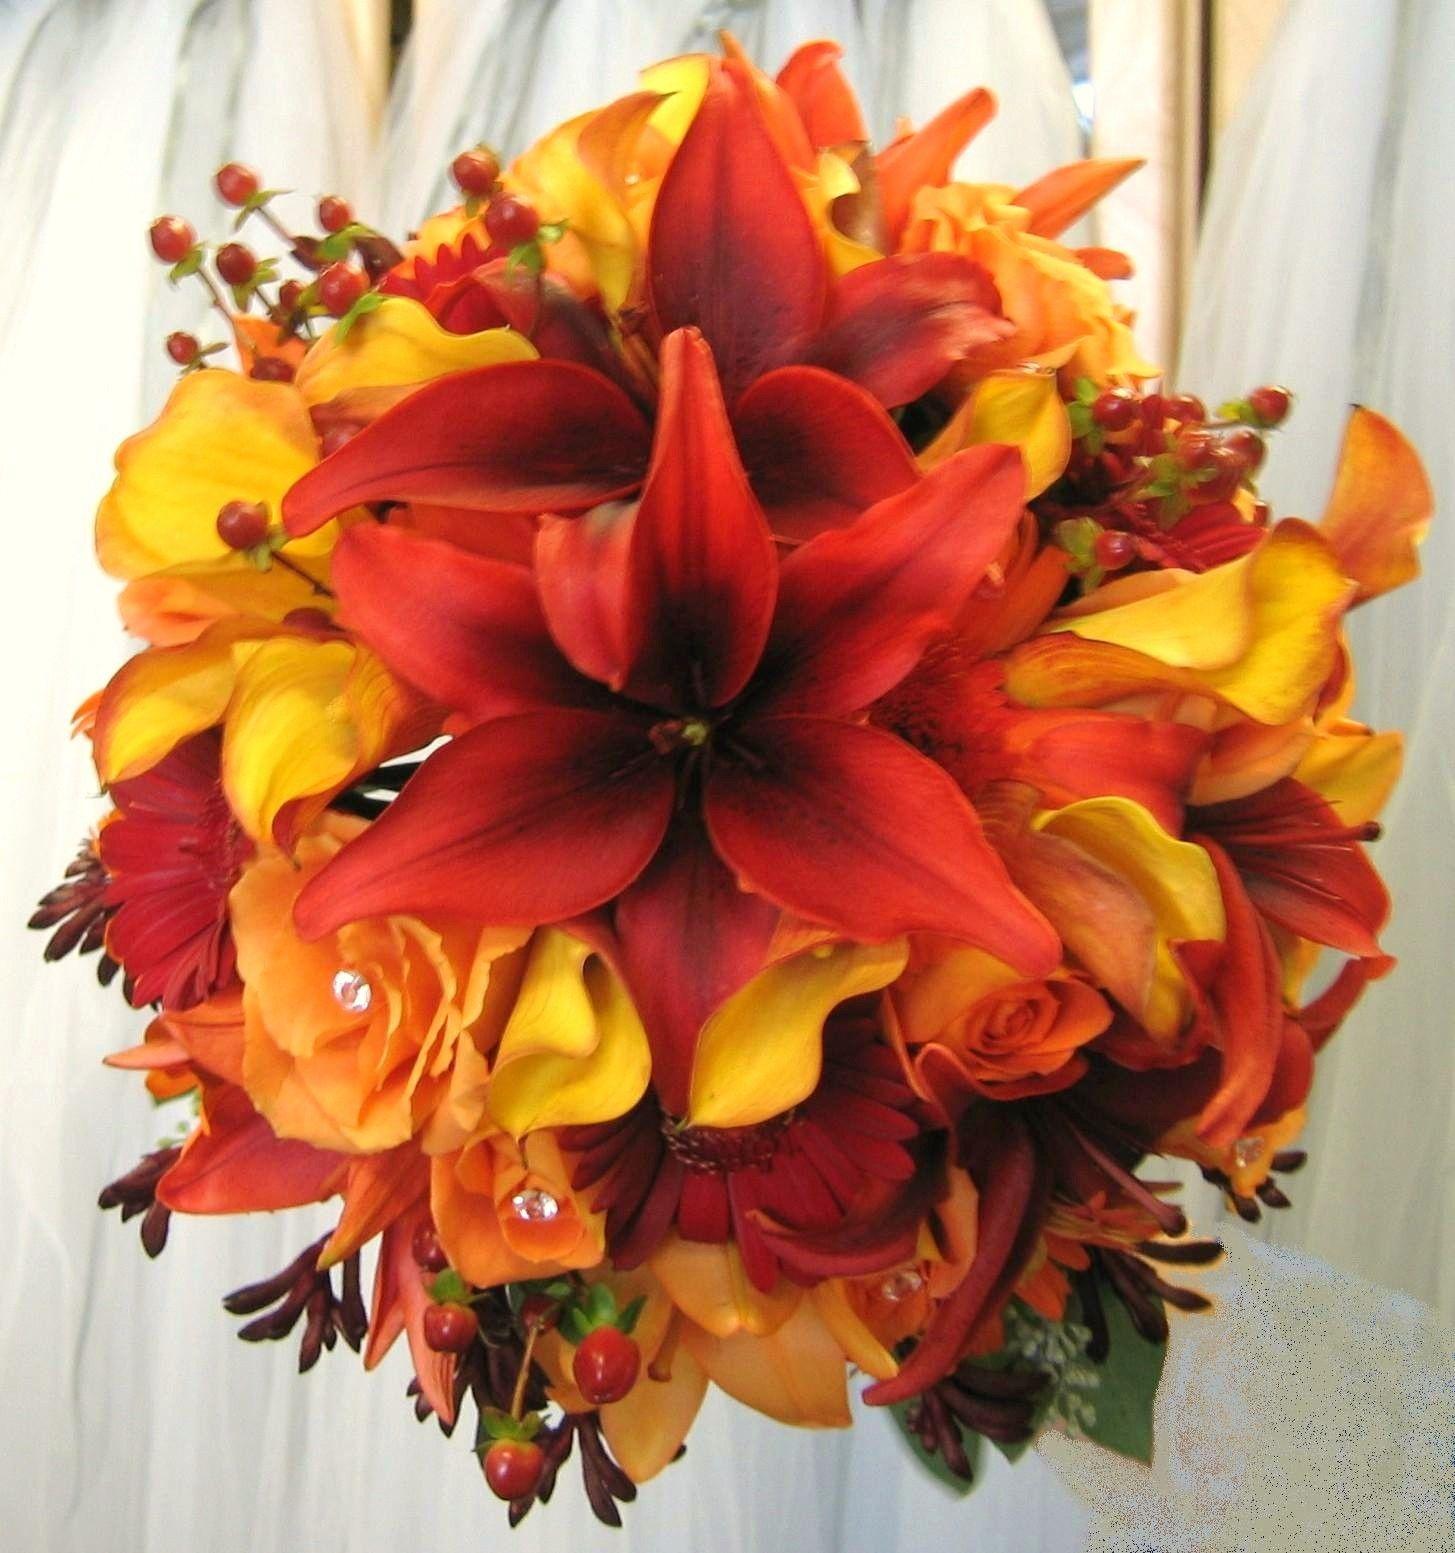 Silk Orange Fall Flowers: Flowers & Decor, Yellow, Orange, Red, Brown, Gold, Bride